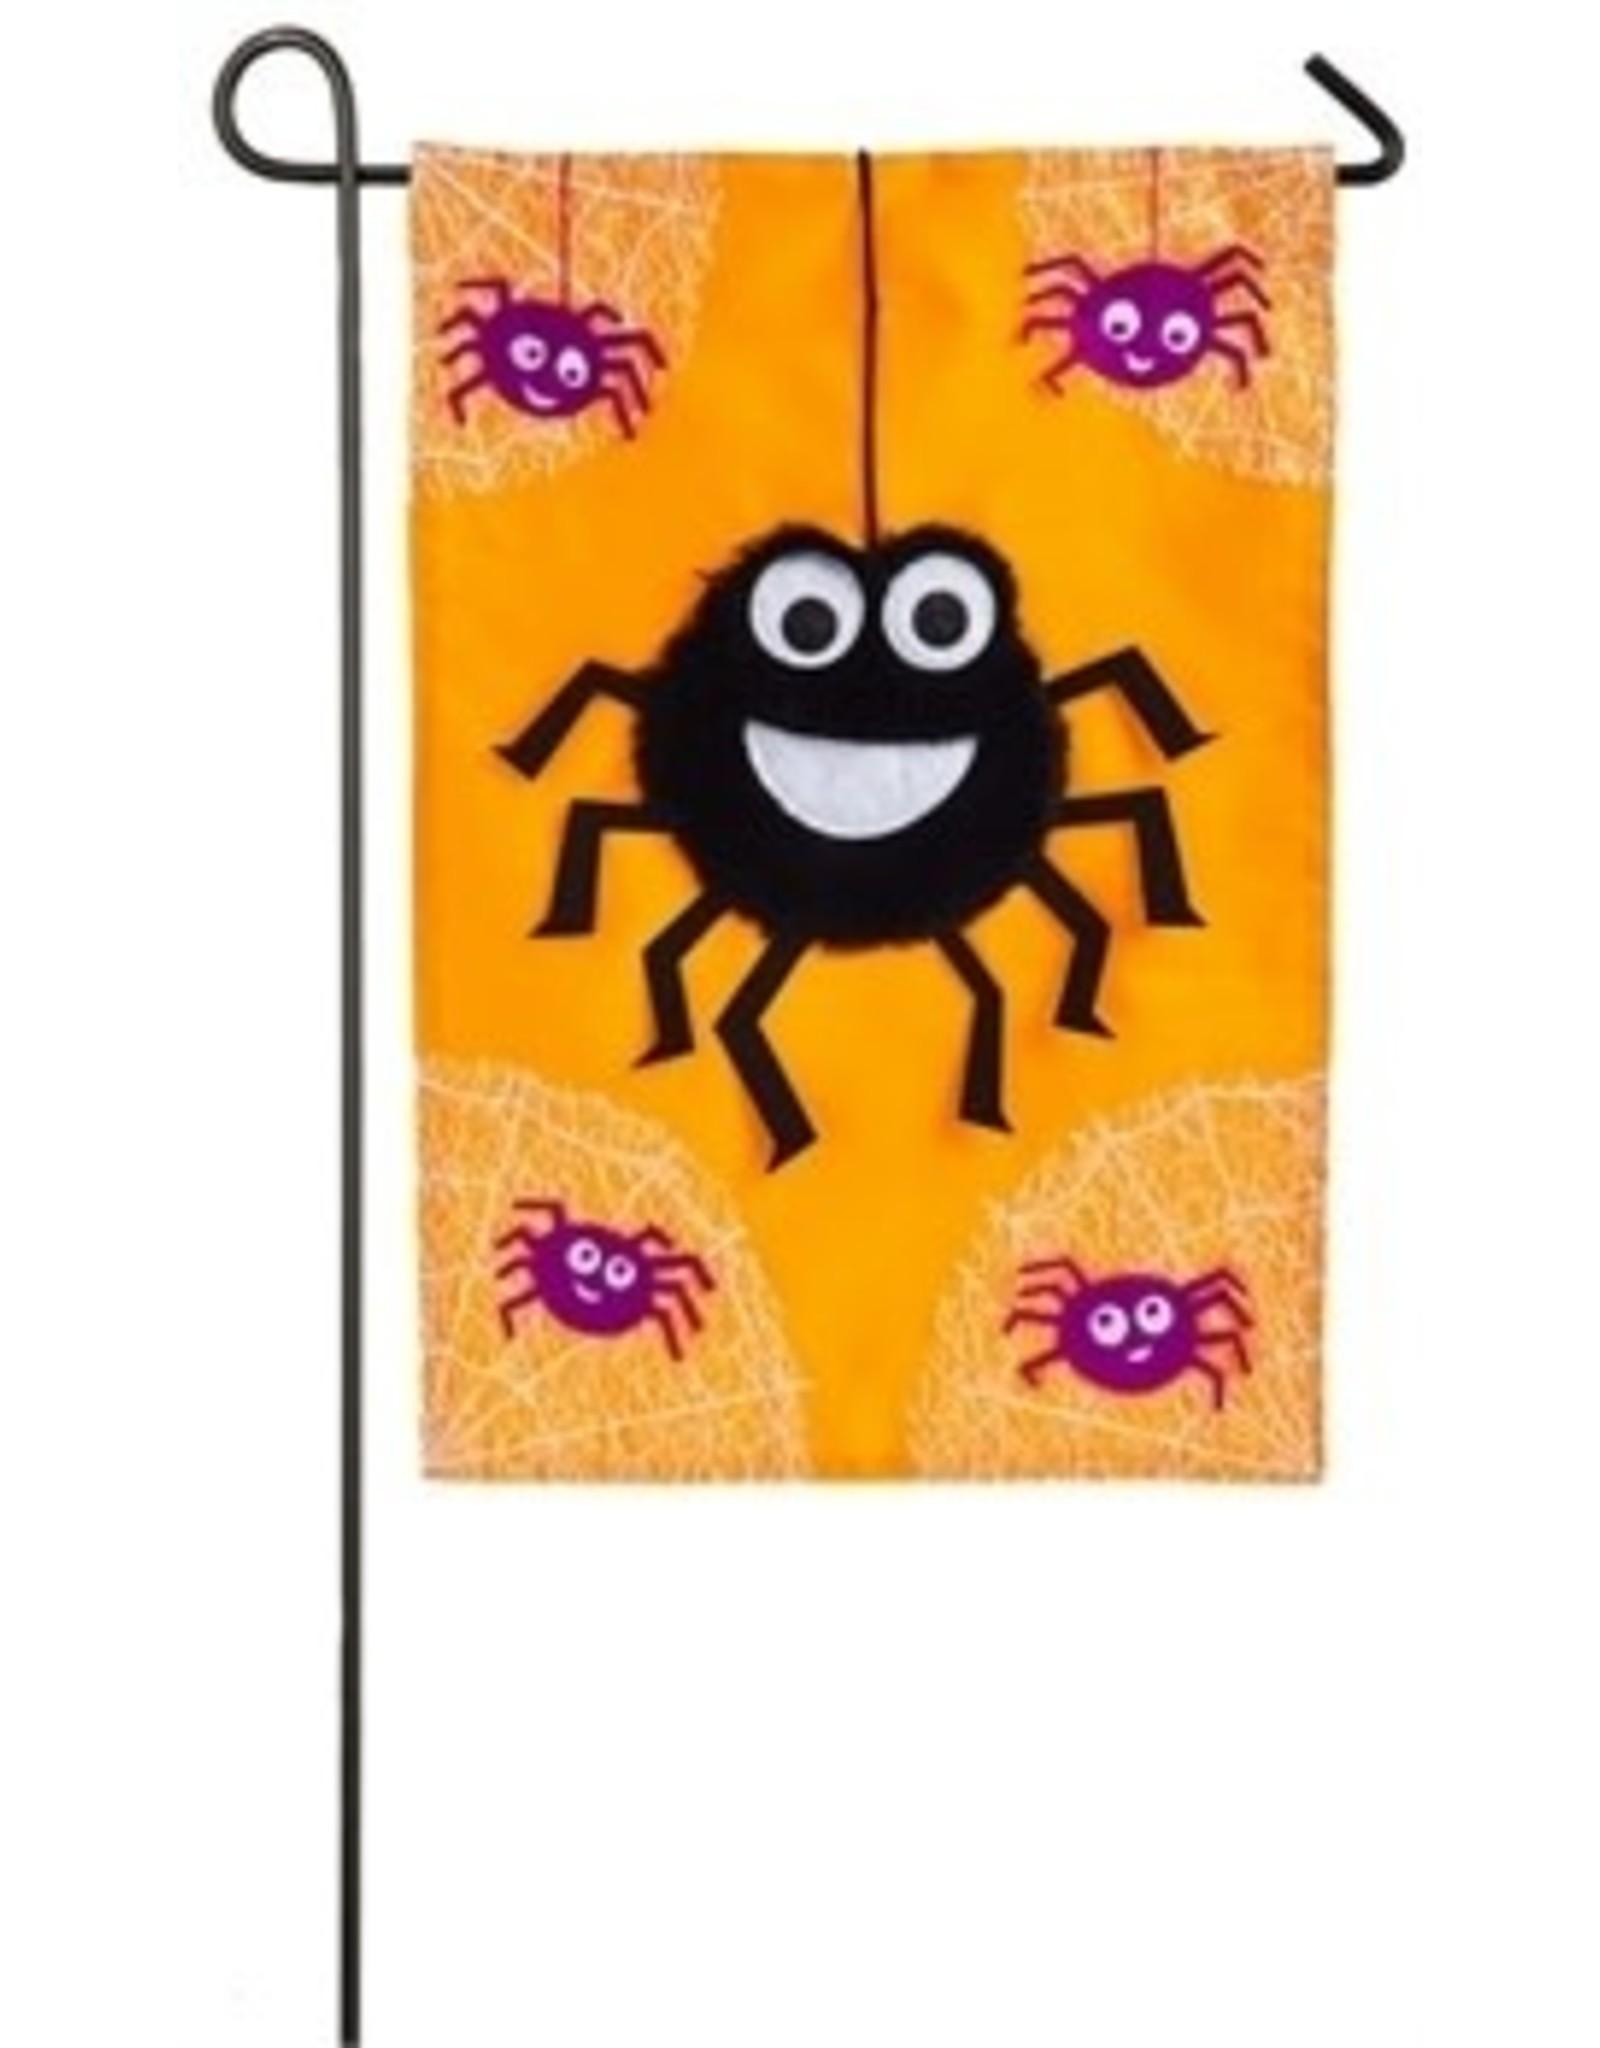 Evergreen Enterprises Dancing Spiders Garden Applique Flag